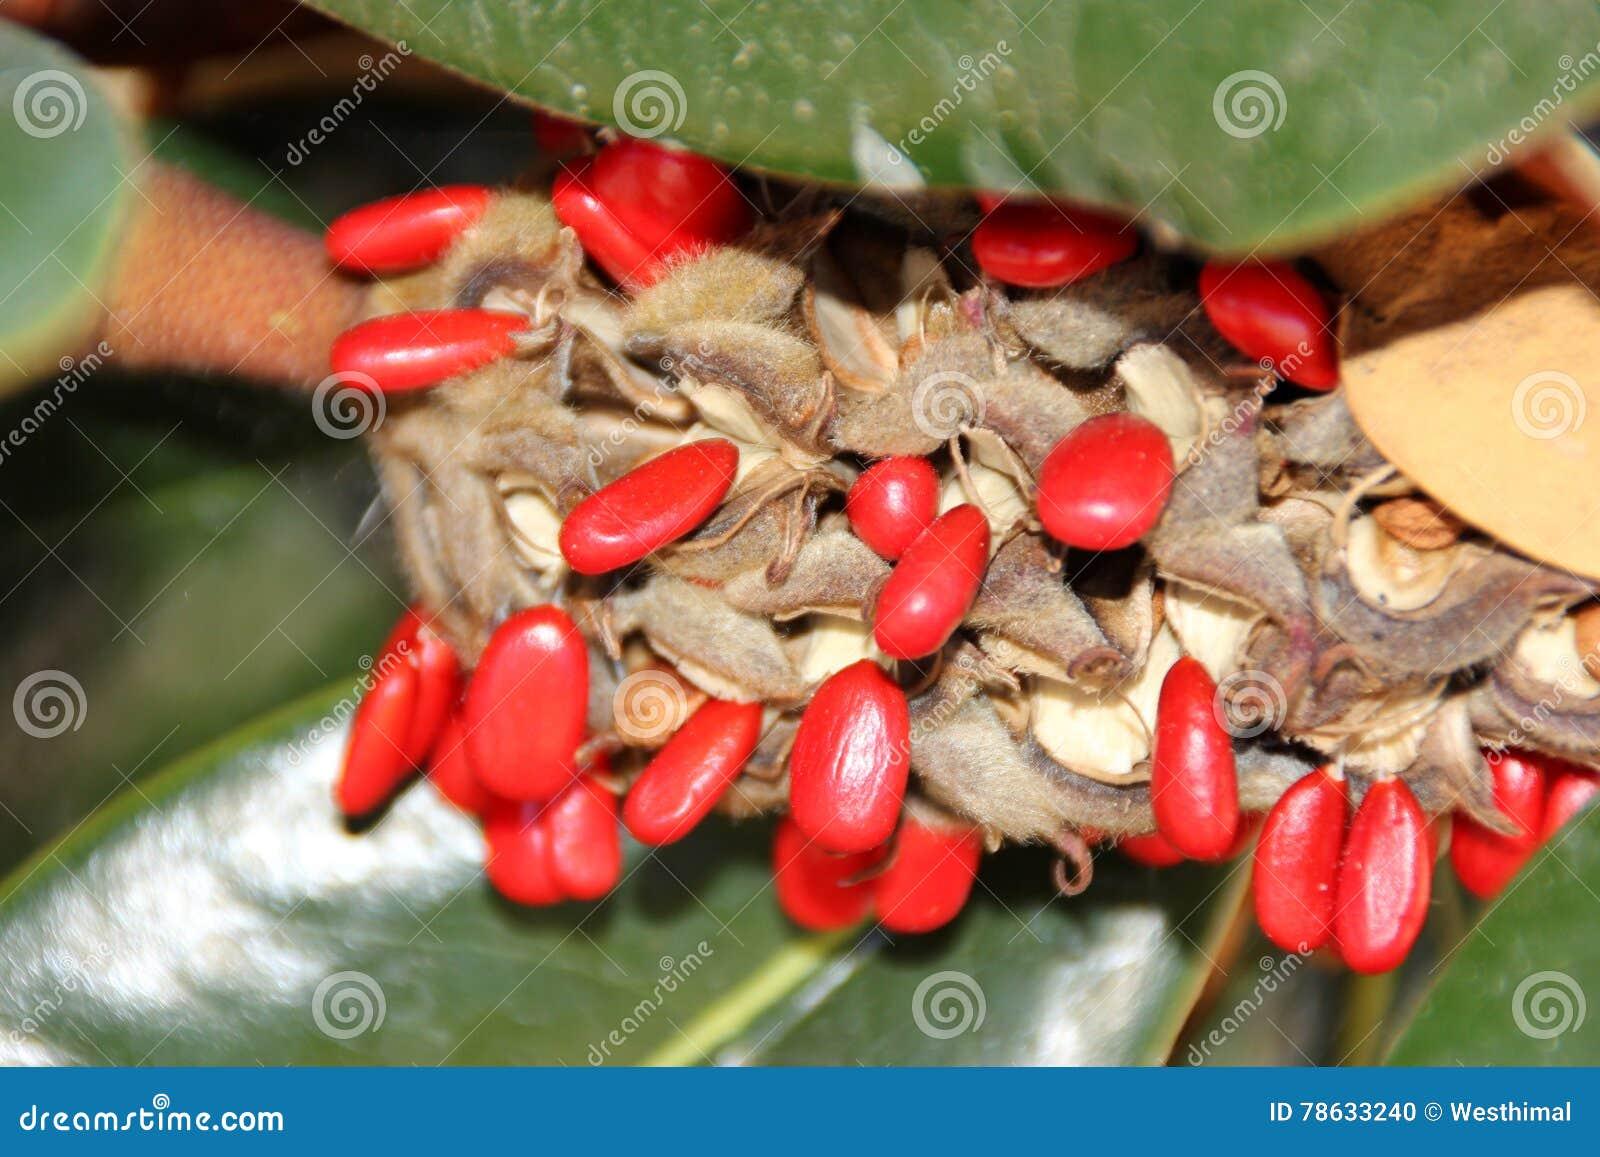 Fruit with red seeds magnolia grandiflora southern - Semilla de magnolia ...